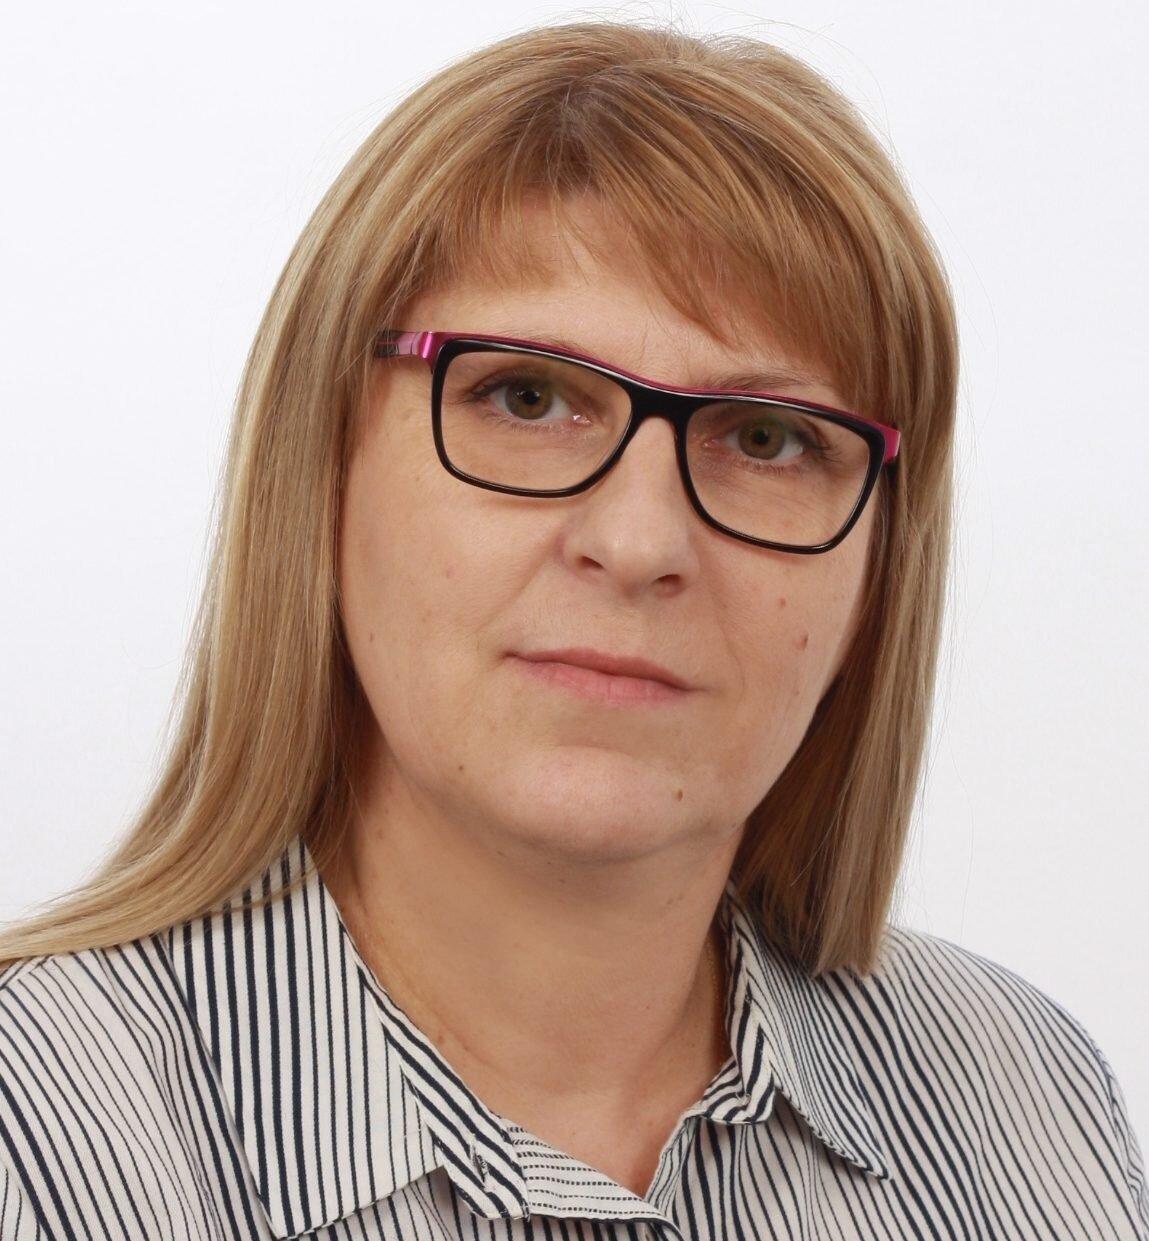 Joanna Bzymek